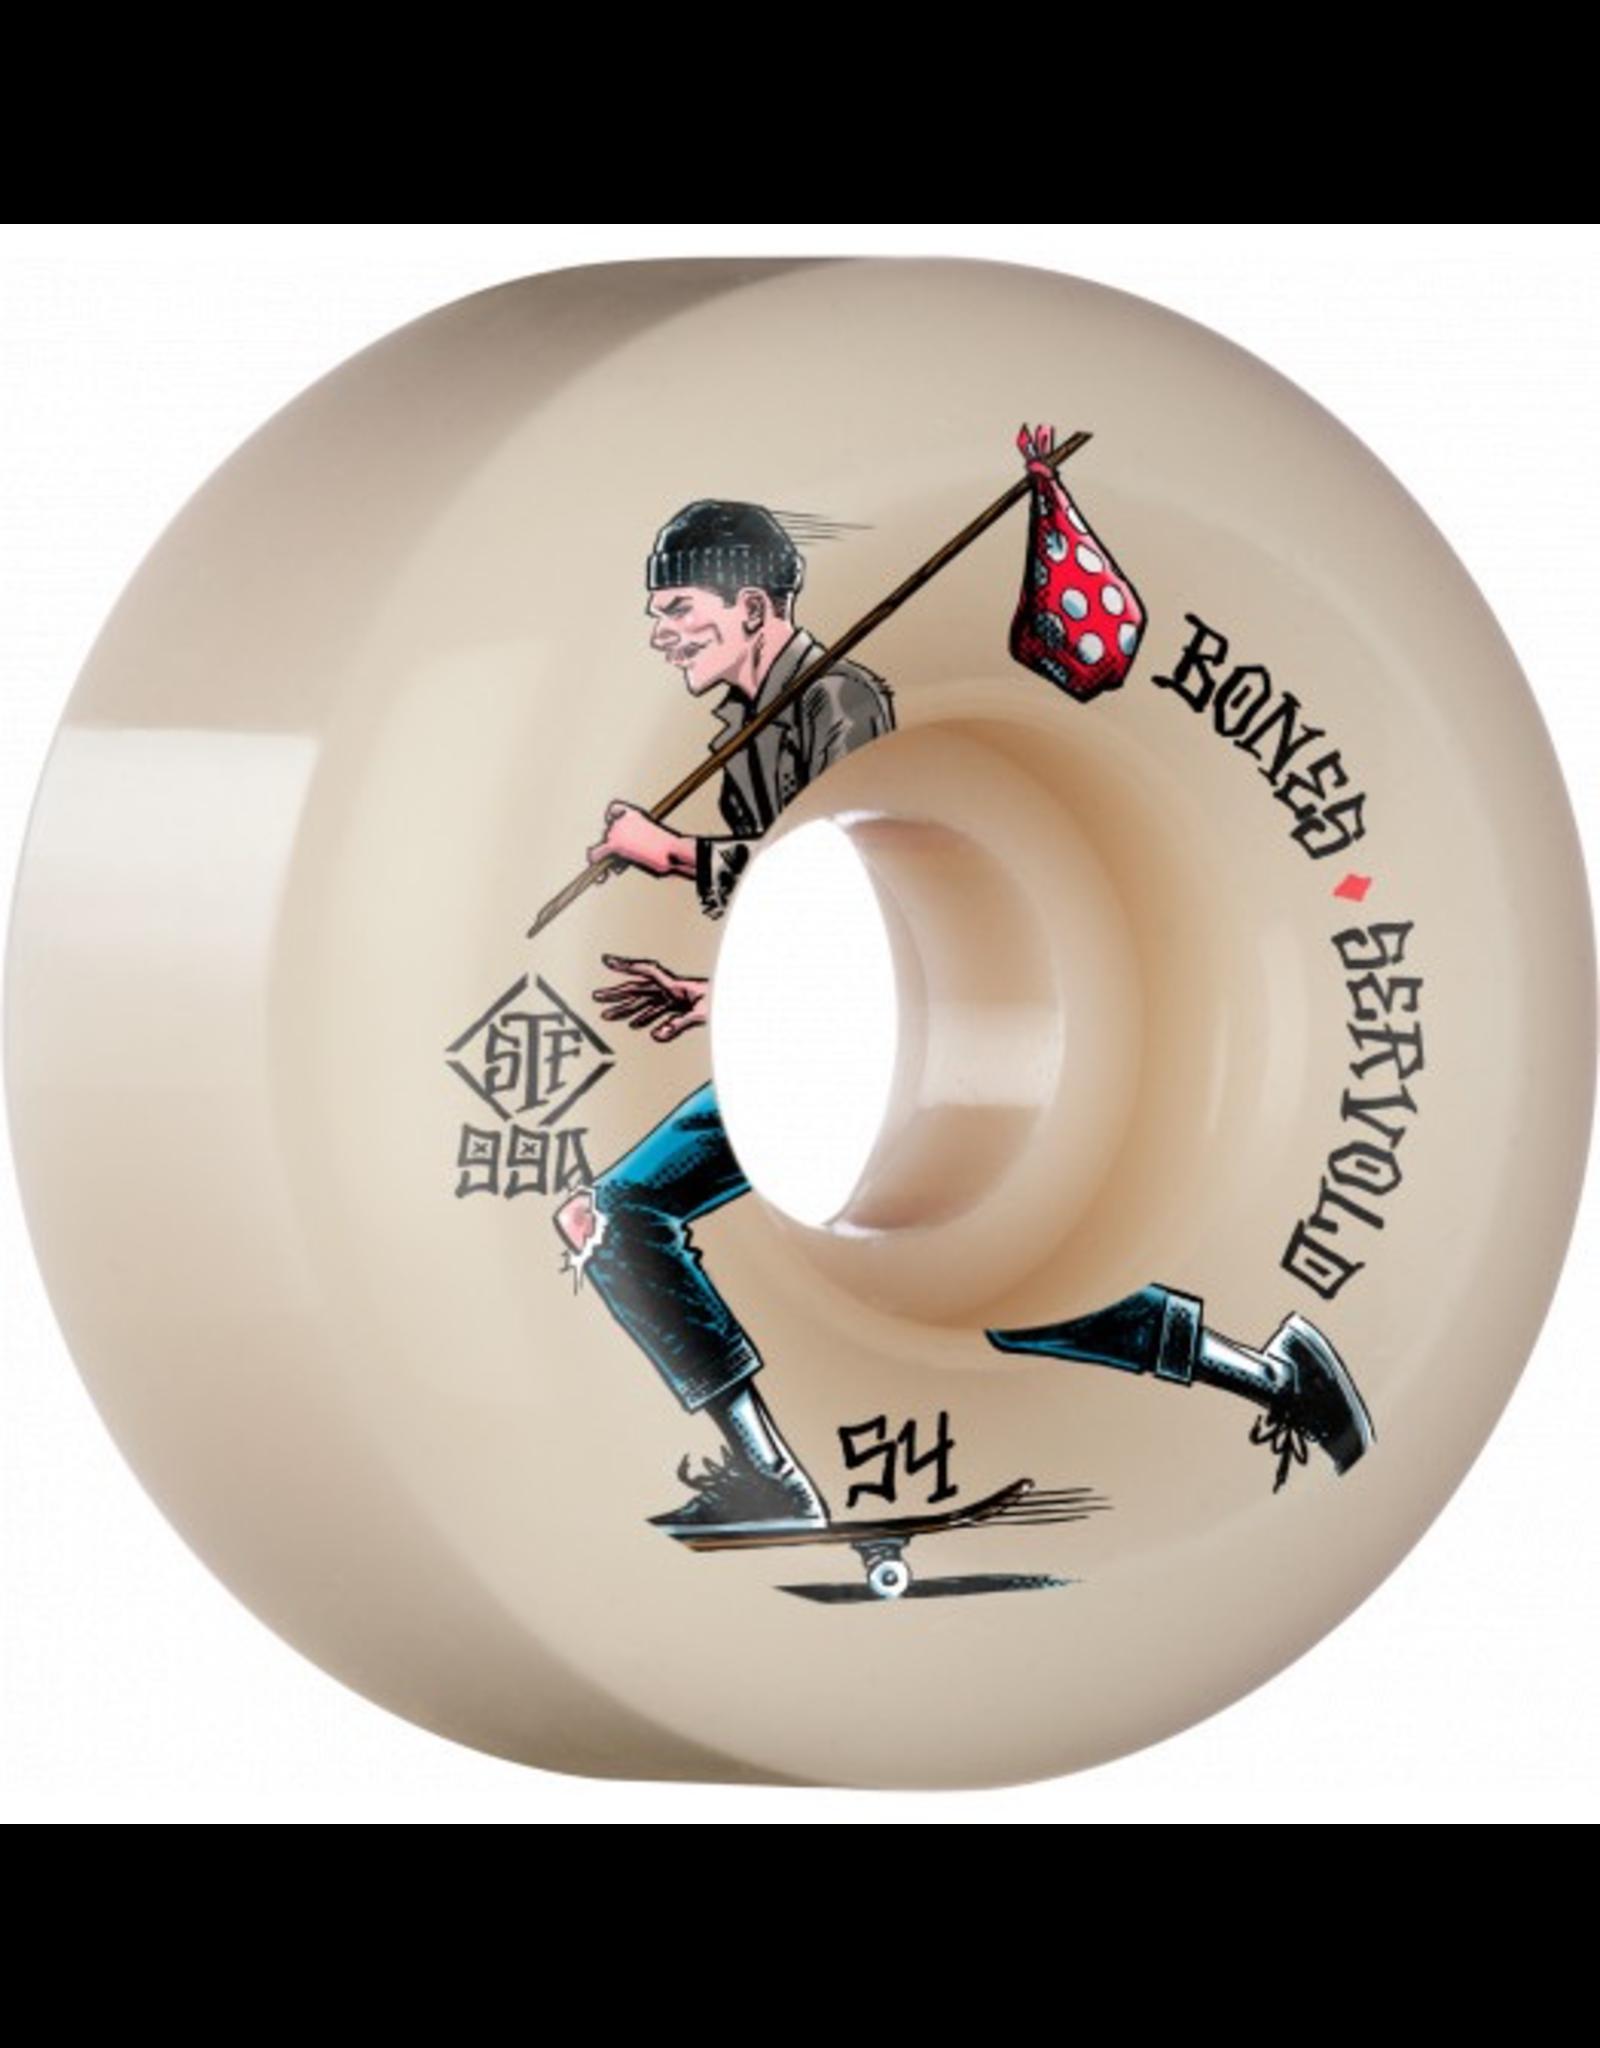 BONES BONES WHEELS PRO STF Skateboard Wheels Servold Gone Skating 54mm V6 Wide-Cut 99a 4pk